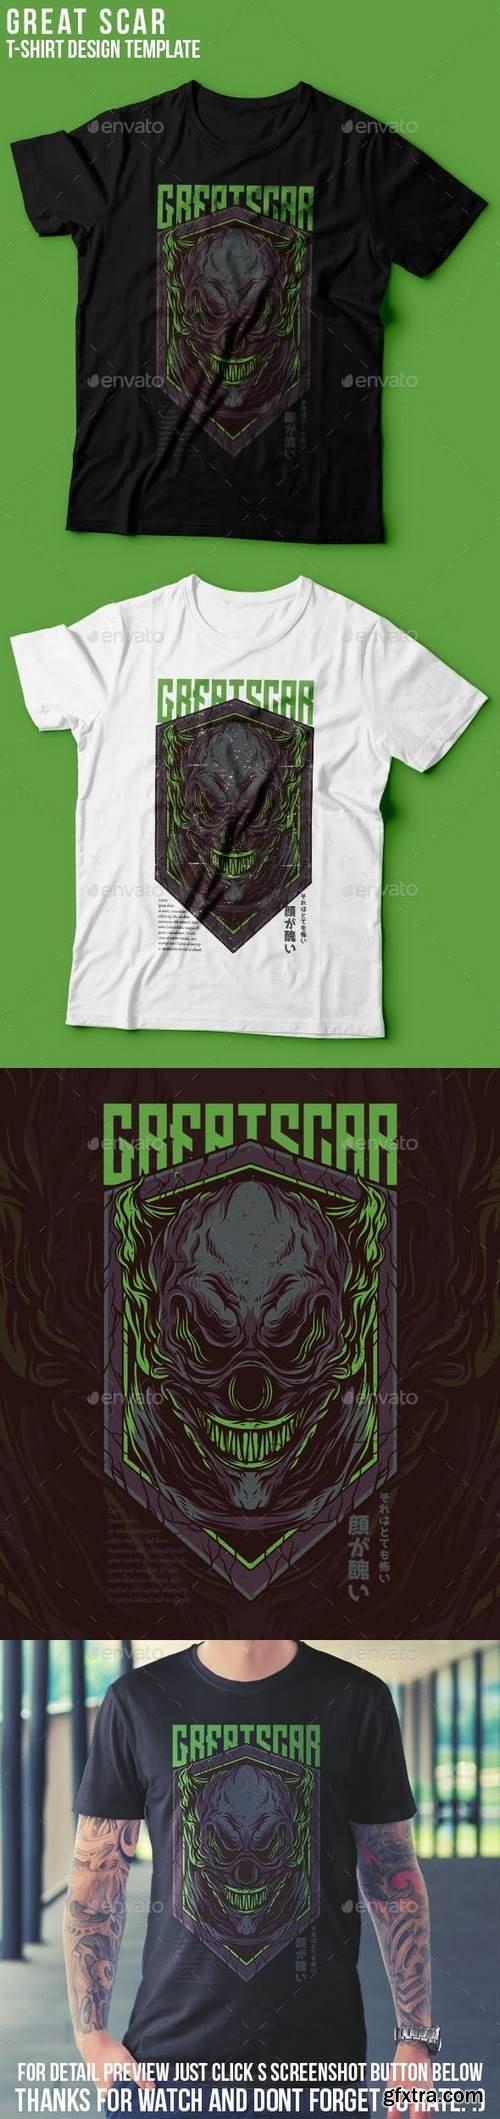 Graphicriver - Great Scar T-Shirt Design 22939359